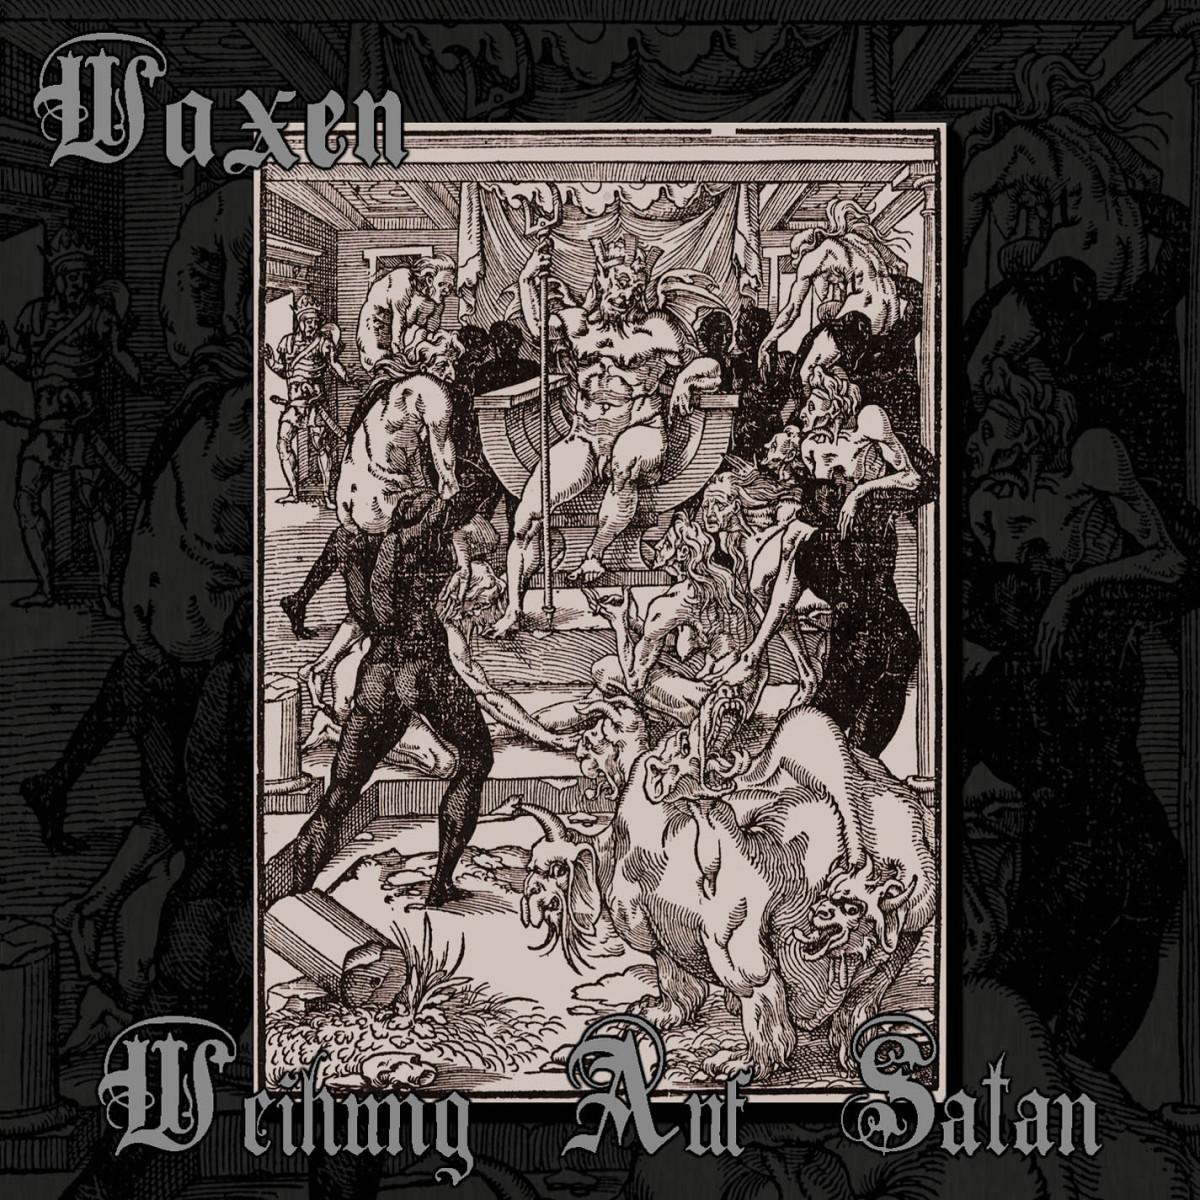 6-25-Waxen-Weihung-Auf-Satan